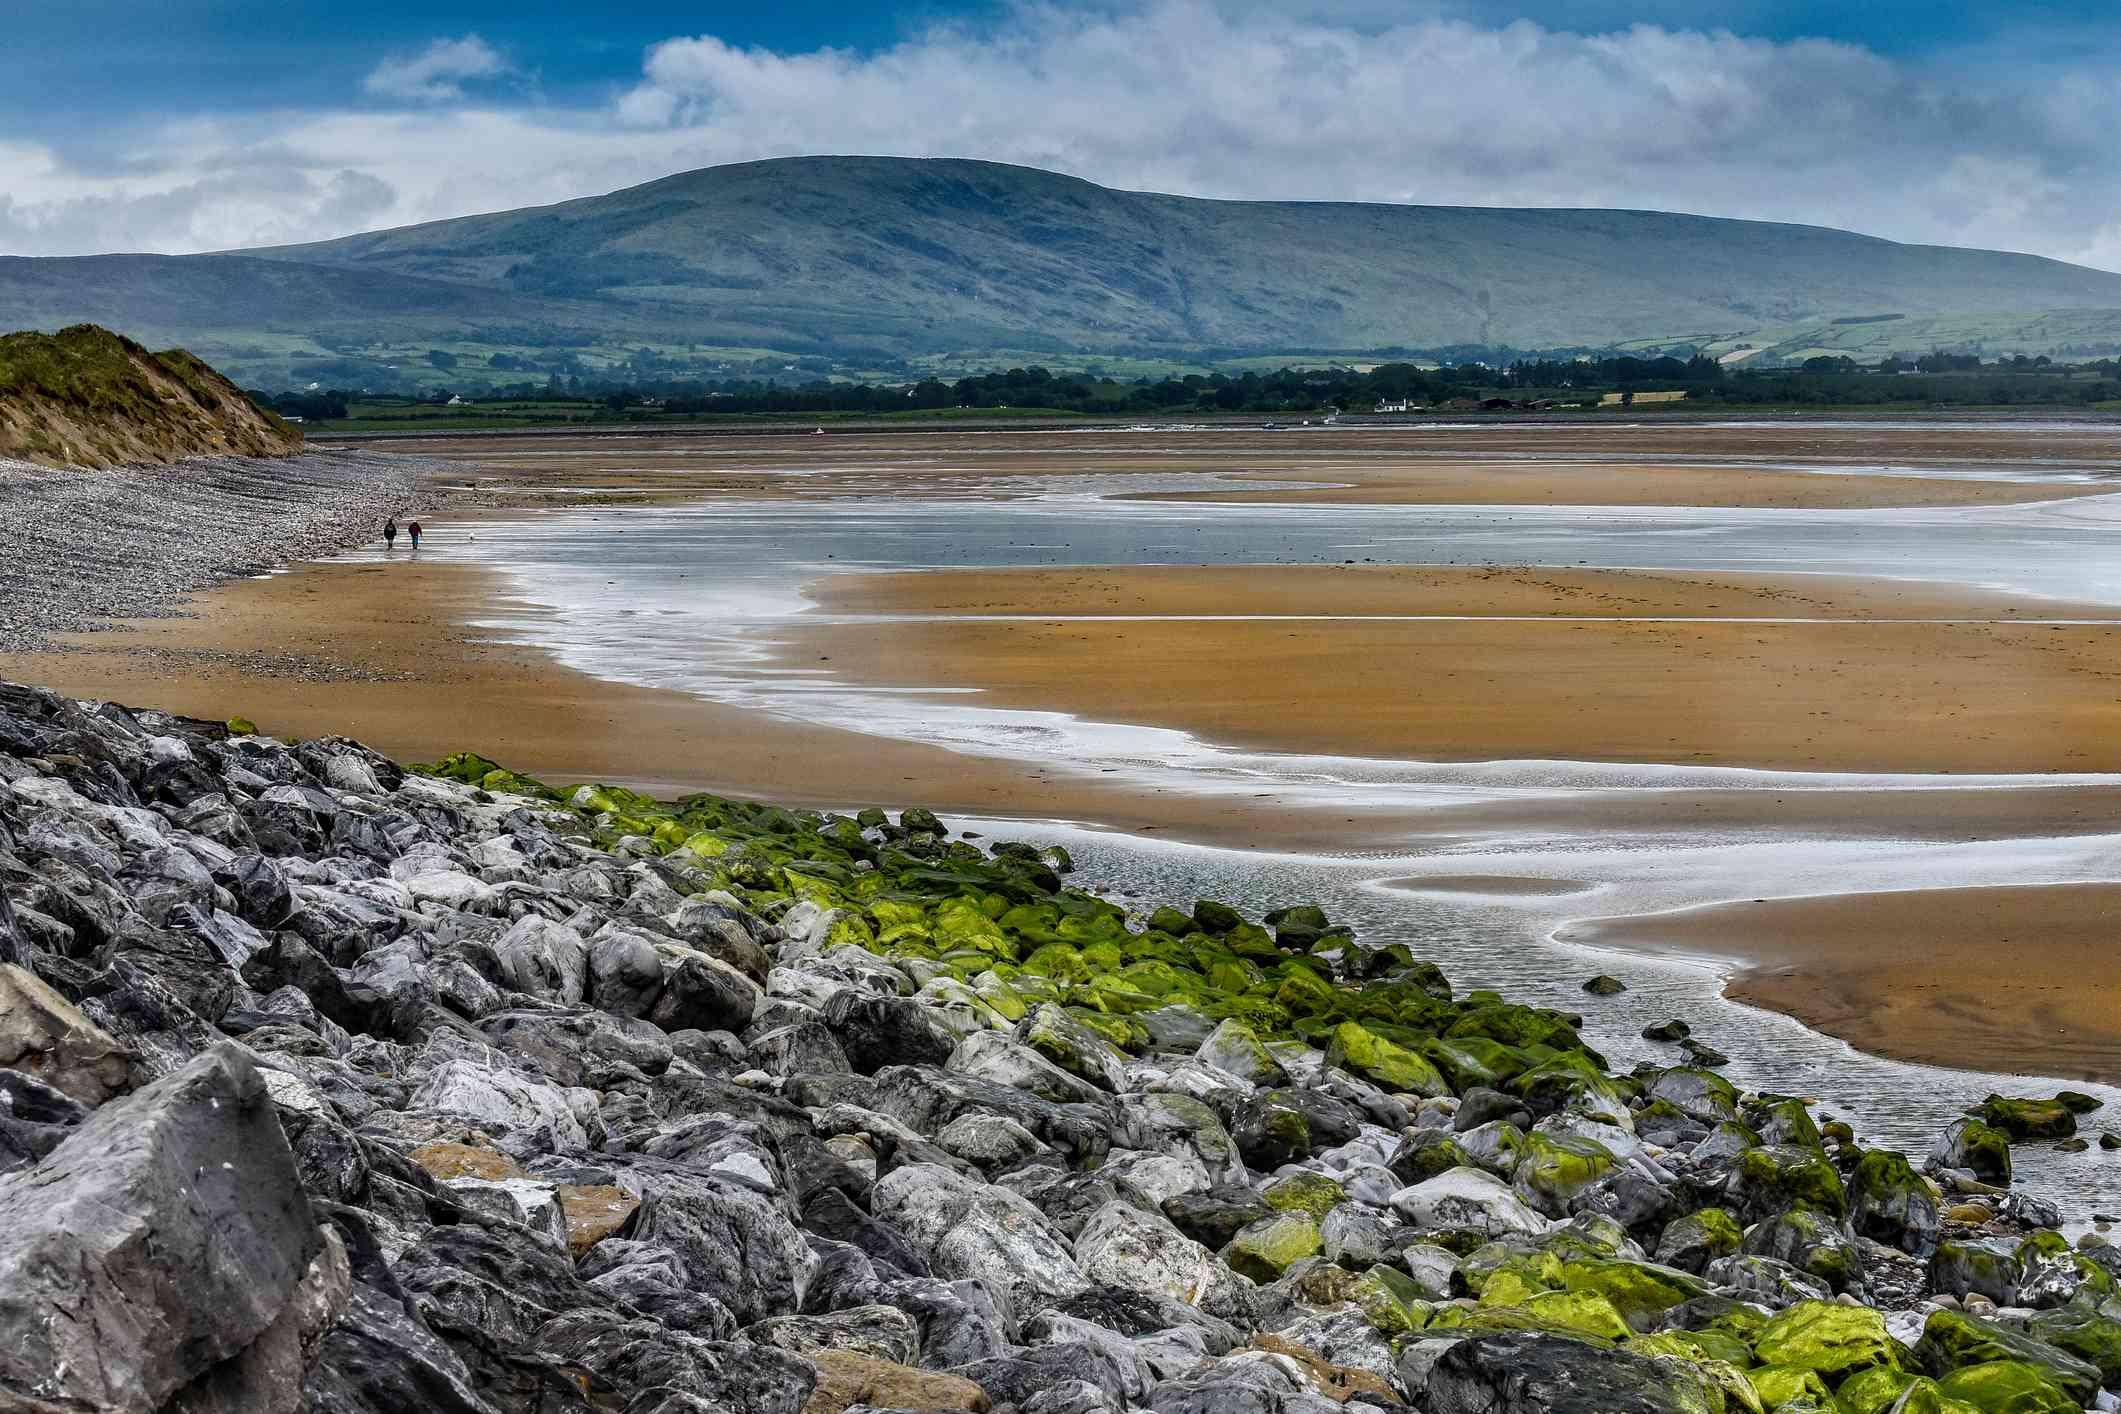 rocky and sandy beach